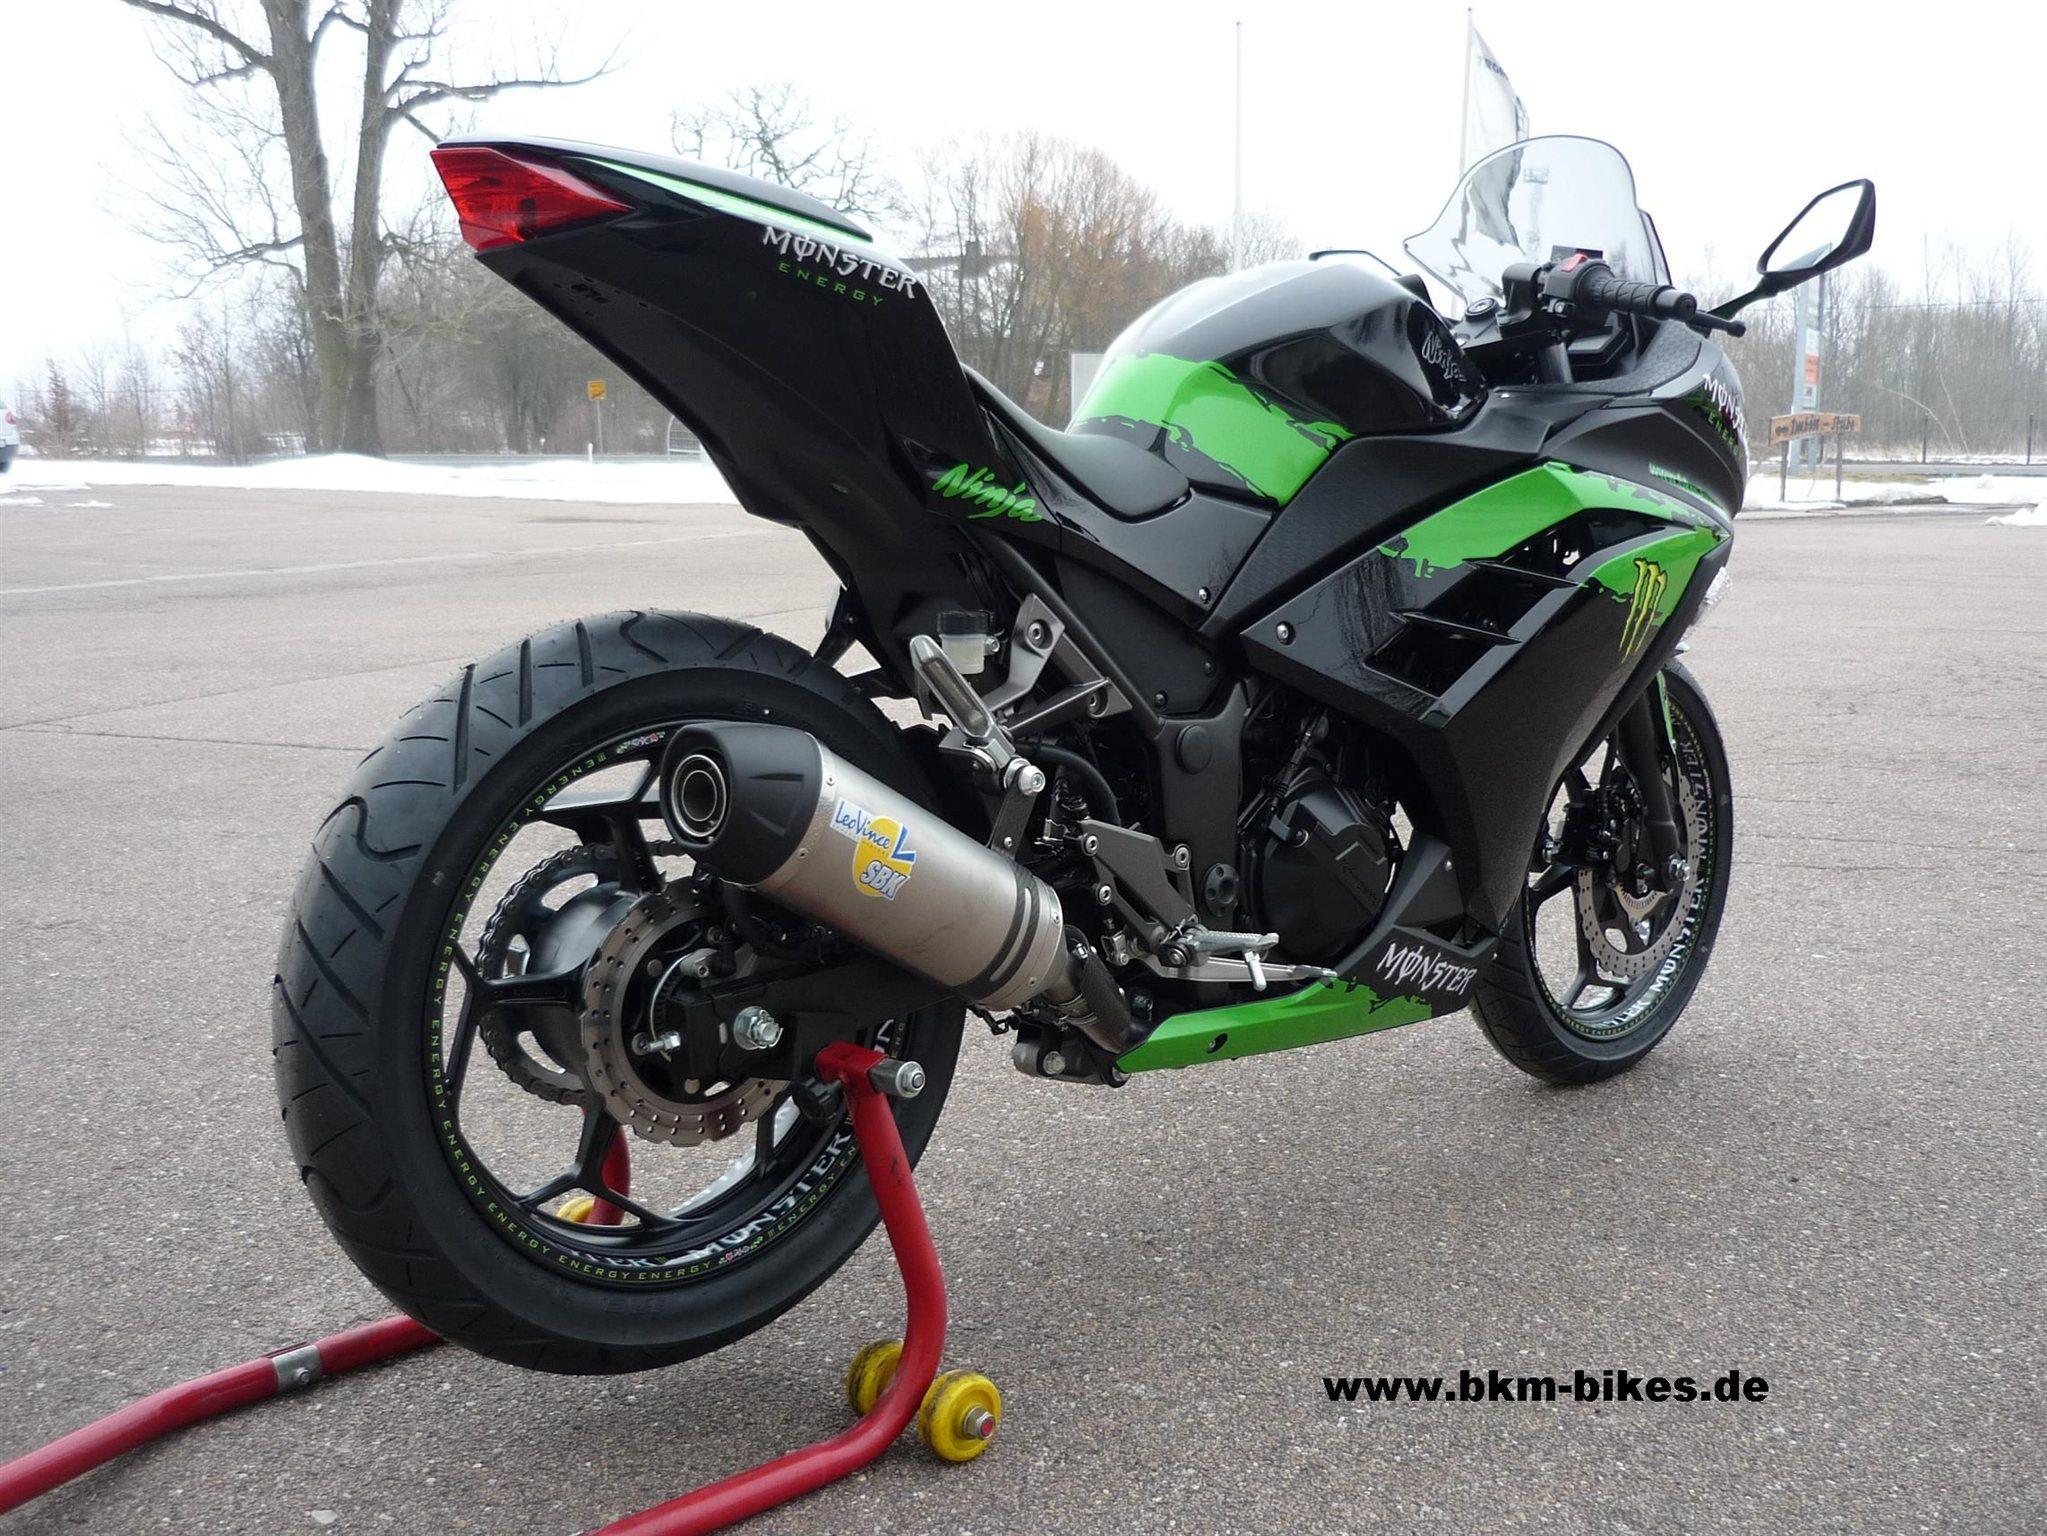 umgebautes motorrad kawasaki ninja 300 von bkm bikes. Black Bedroom Furniture Sets. Home Design Ideas